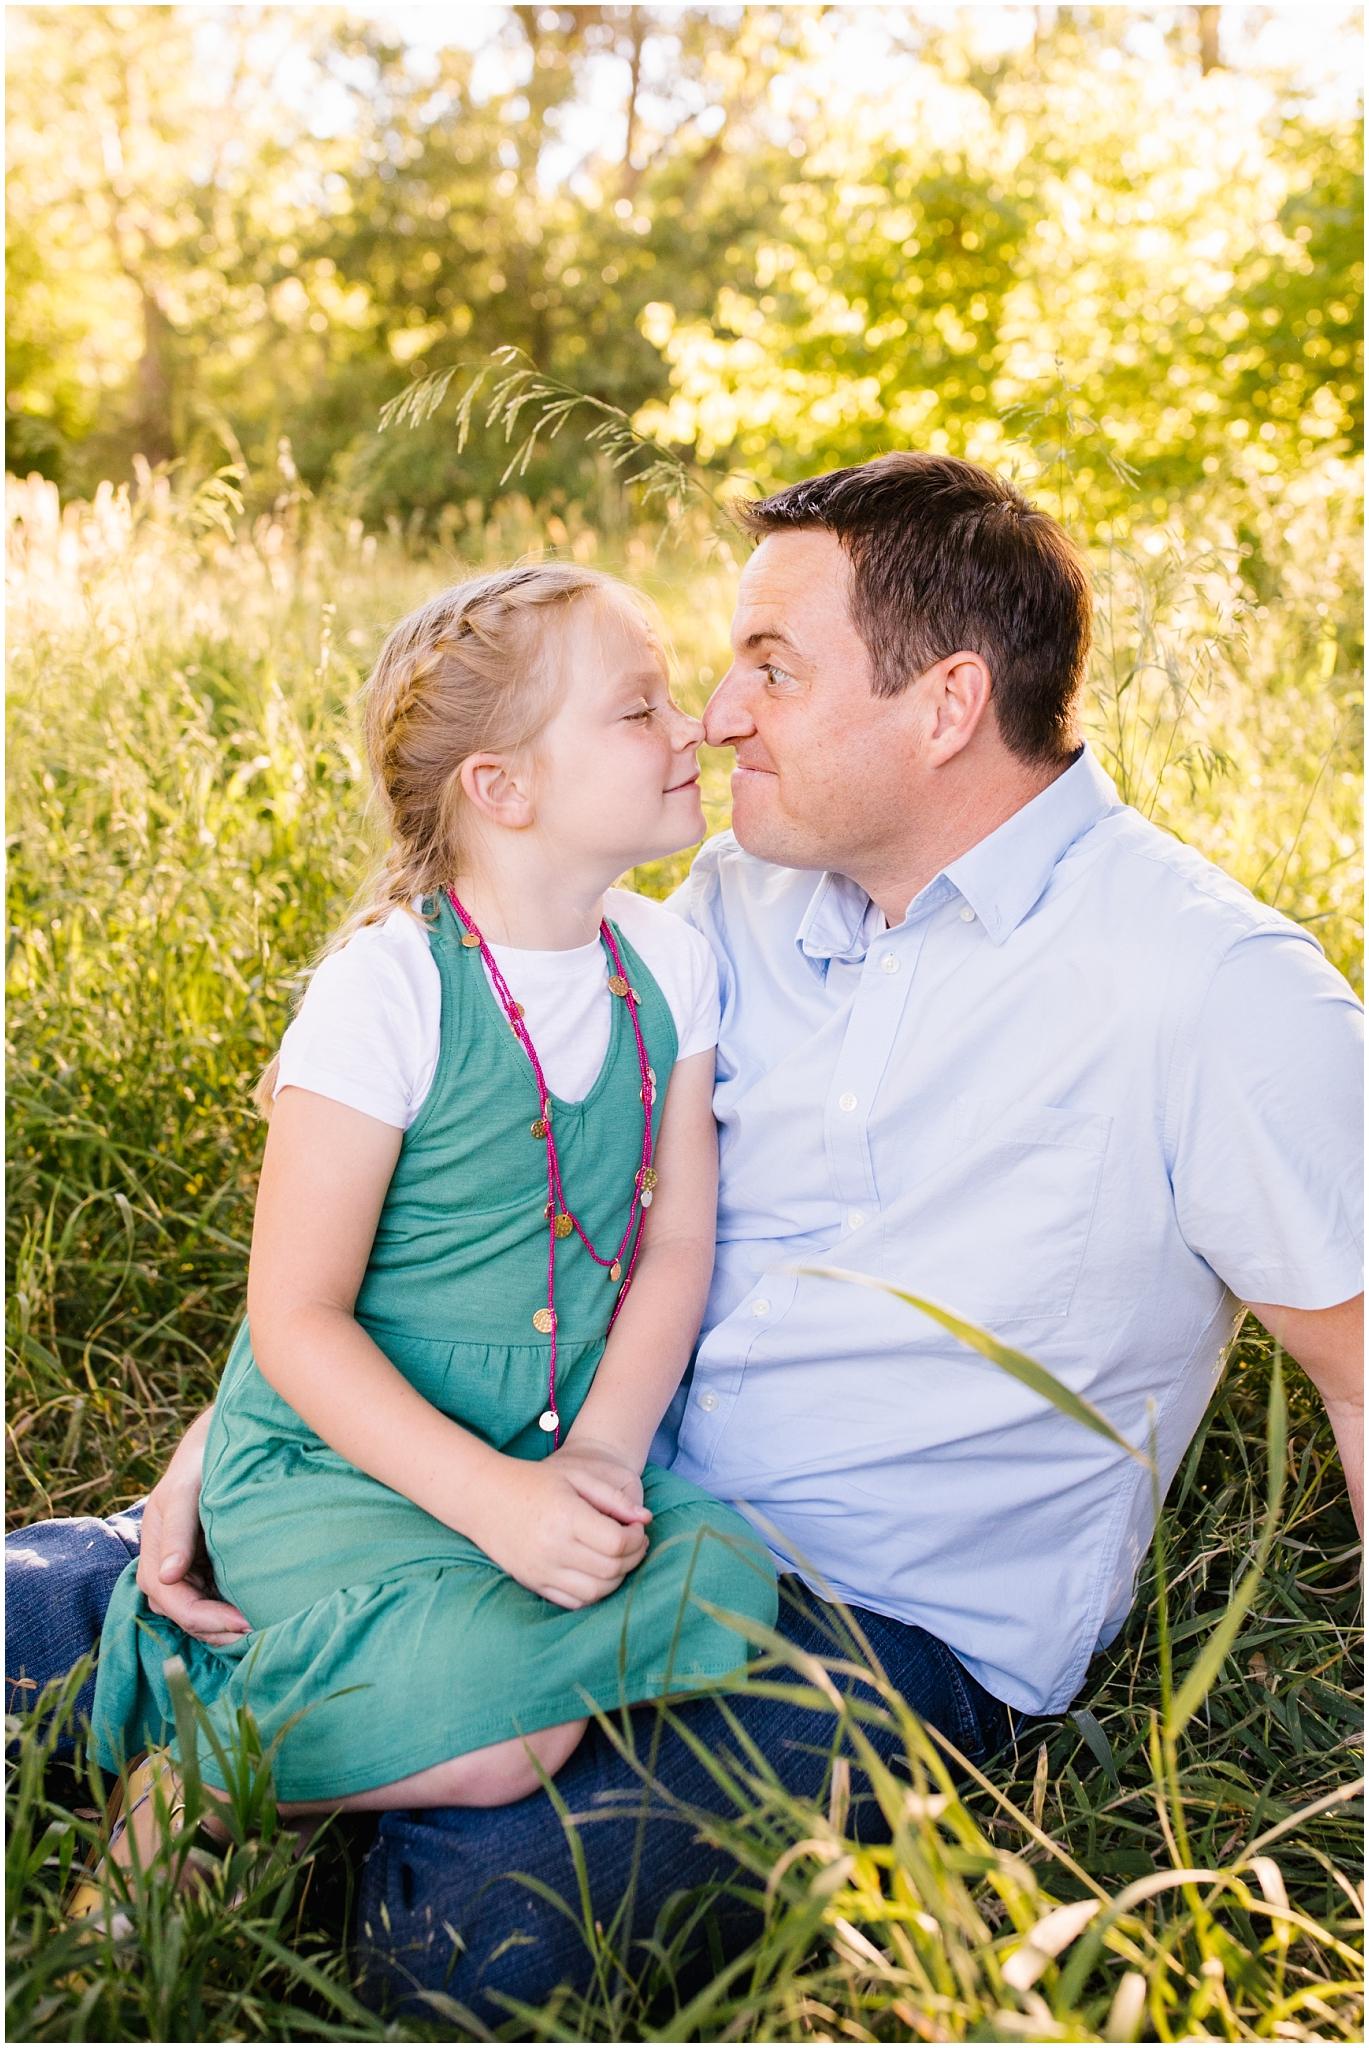 Henderson-19_Lizzie-B-Imagery-Utah-Family-Photographer-Park-City-Salt-Lake-City-Springville-Hobble-Creek-Canyon-Jolleys-Ranch.jpg